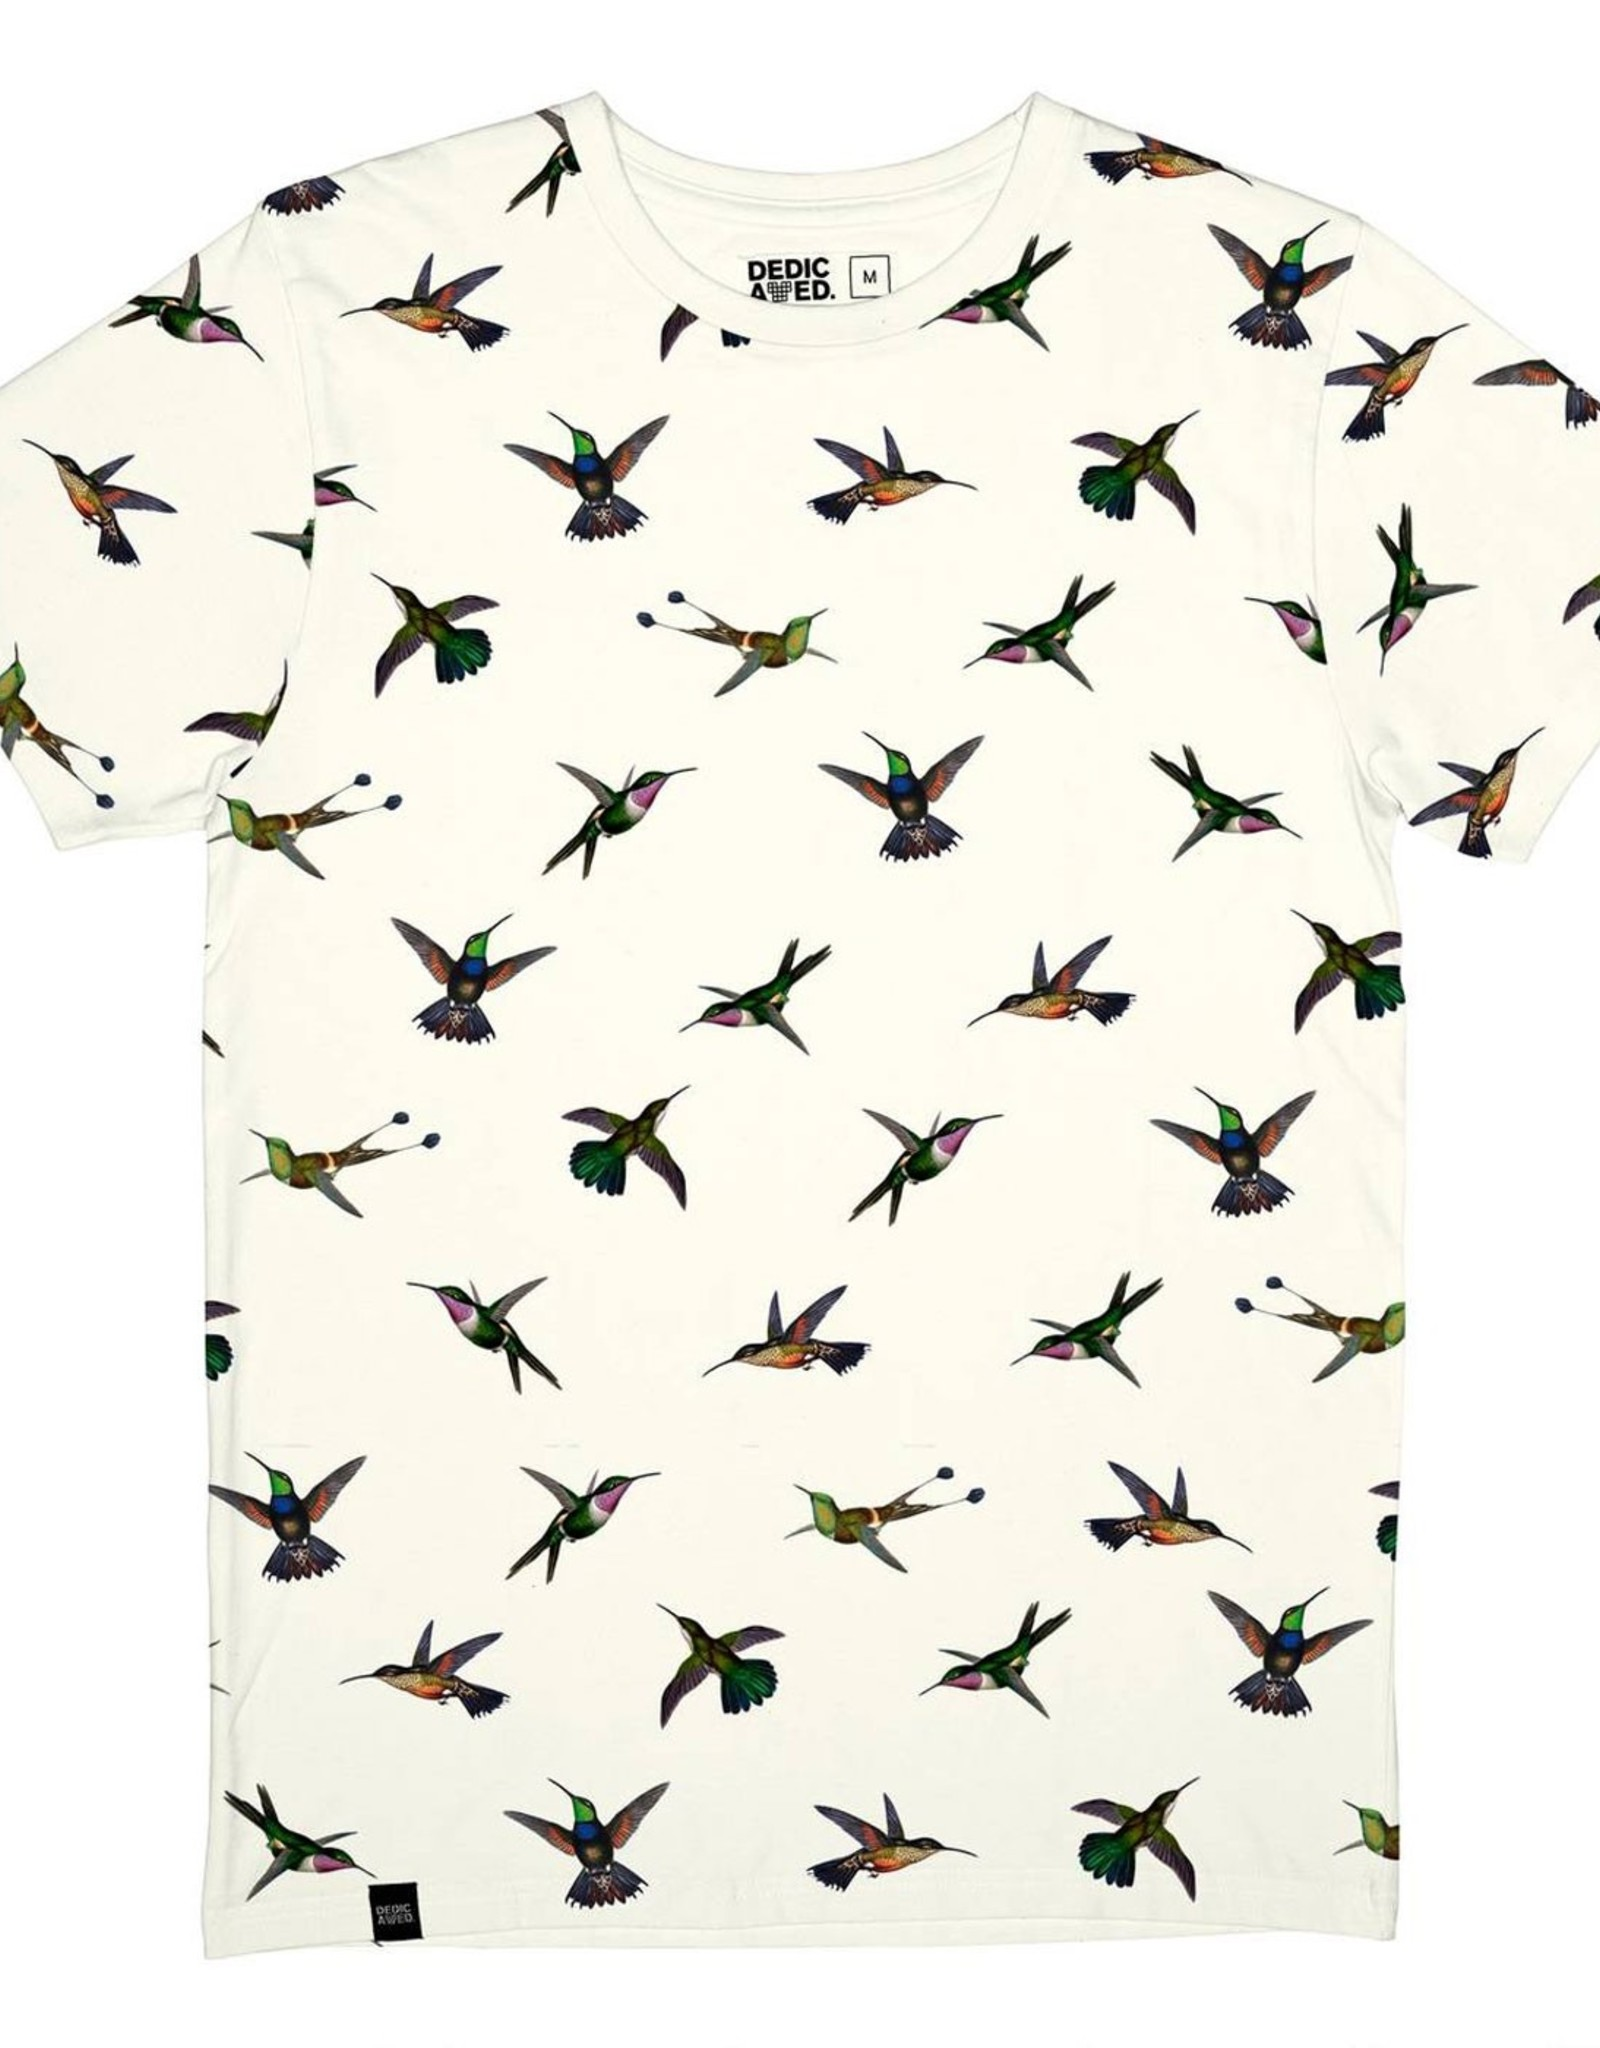 Dedicated T-SHIRT BIRDS